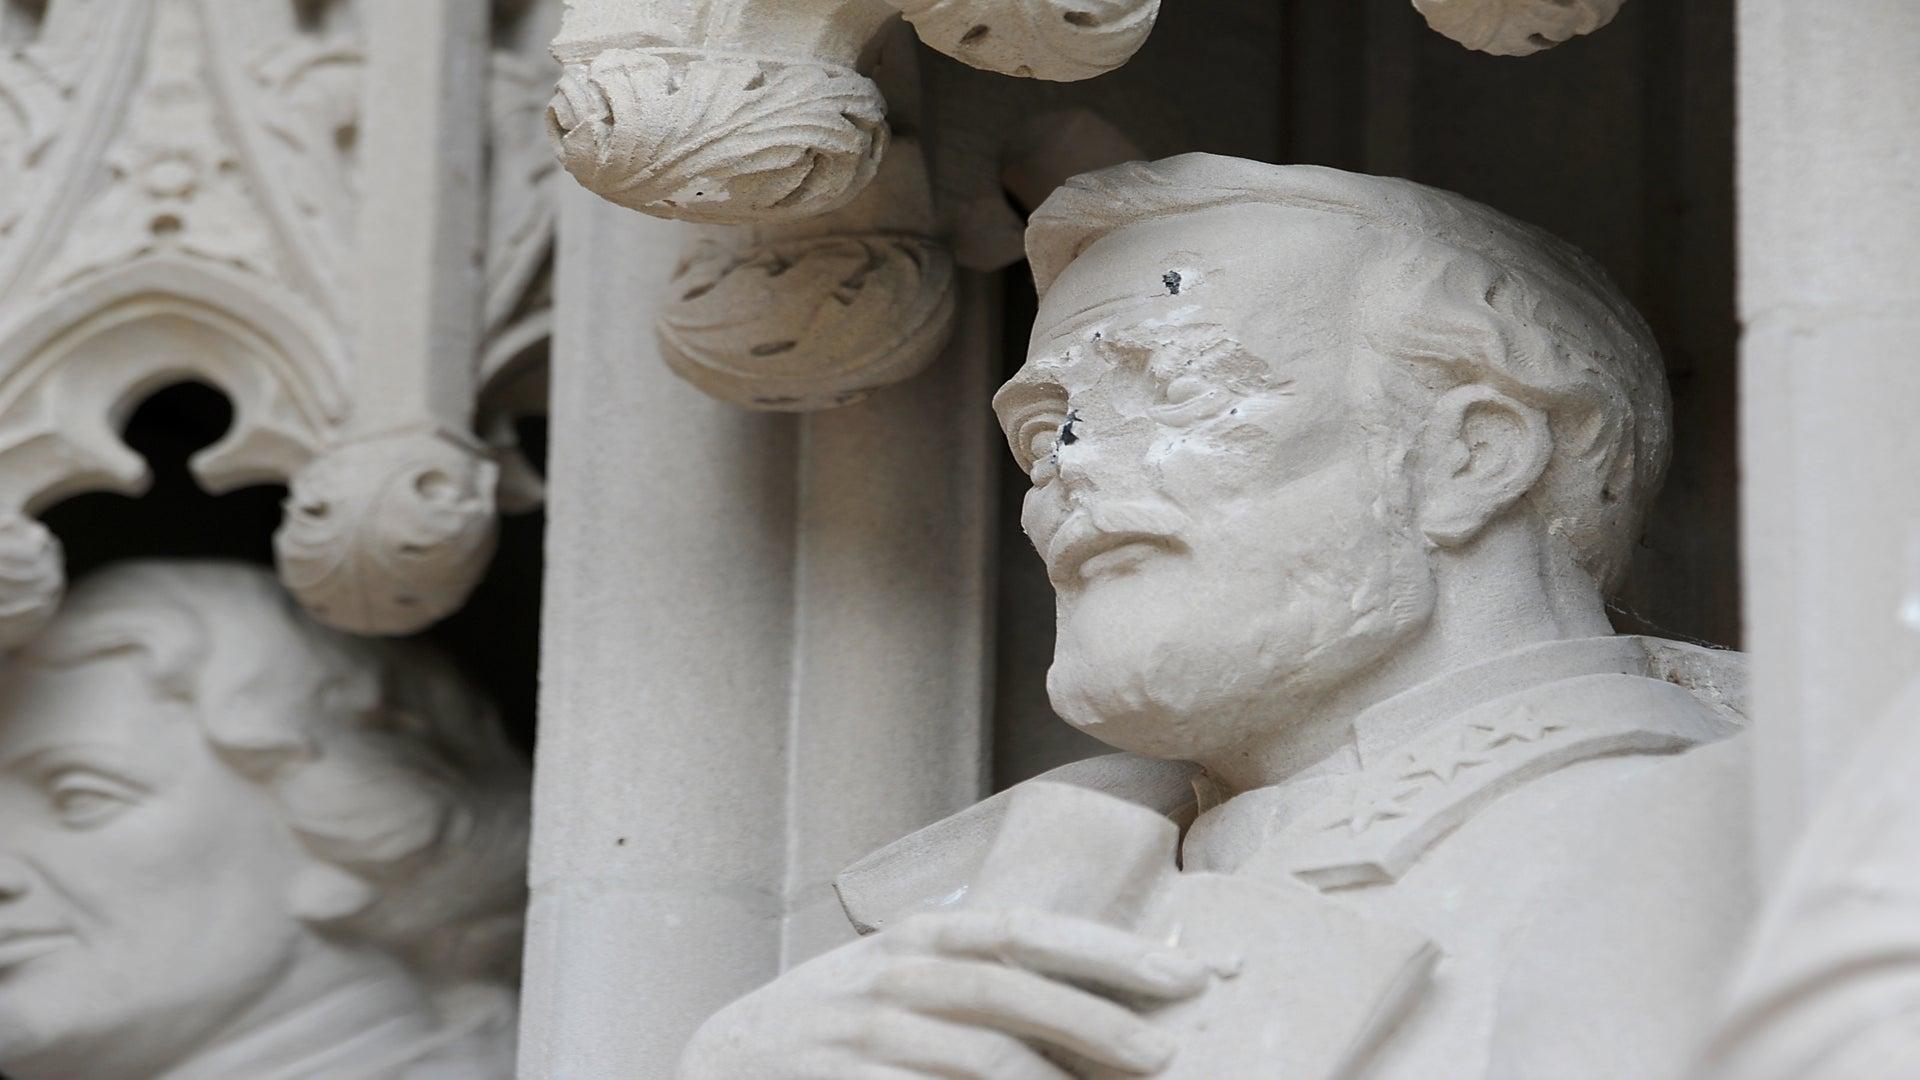 Duke University Takes Down Gen. Robert E. Lee Statue